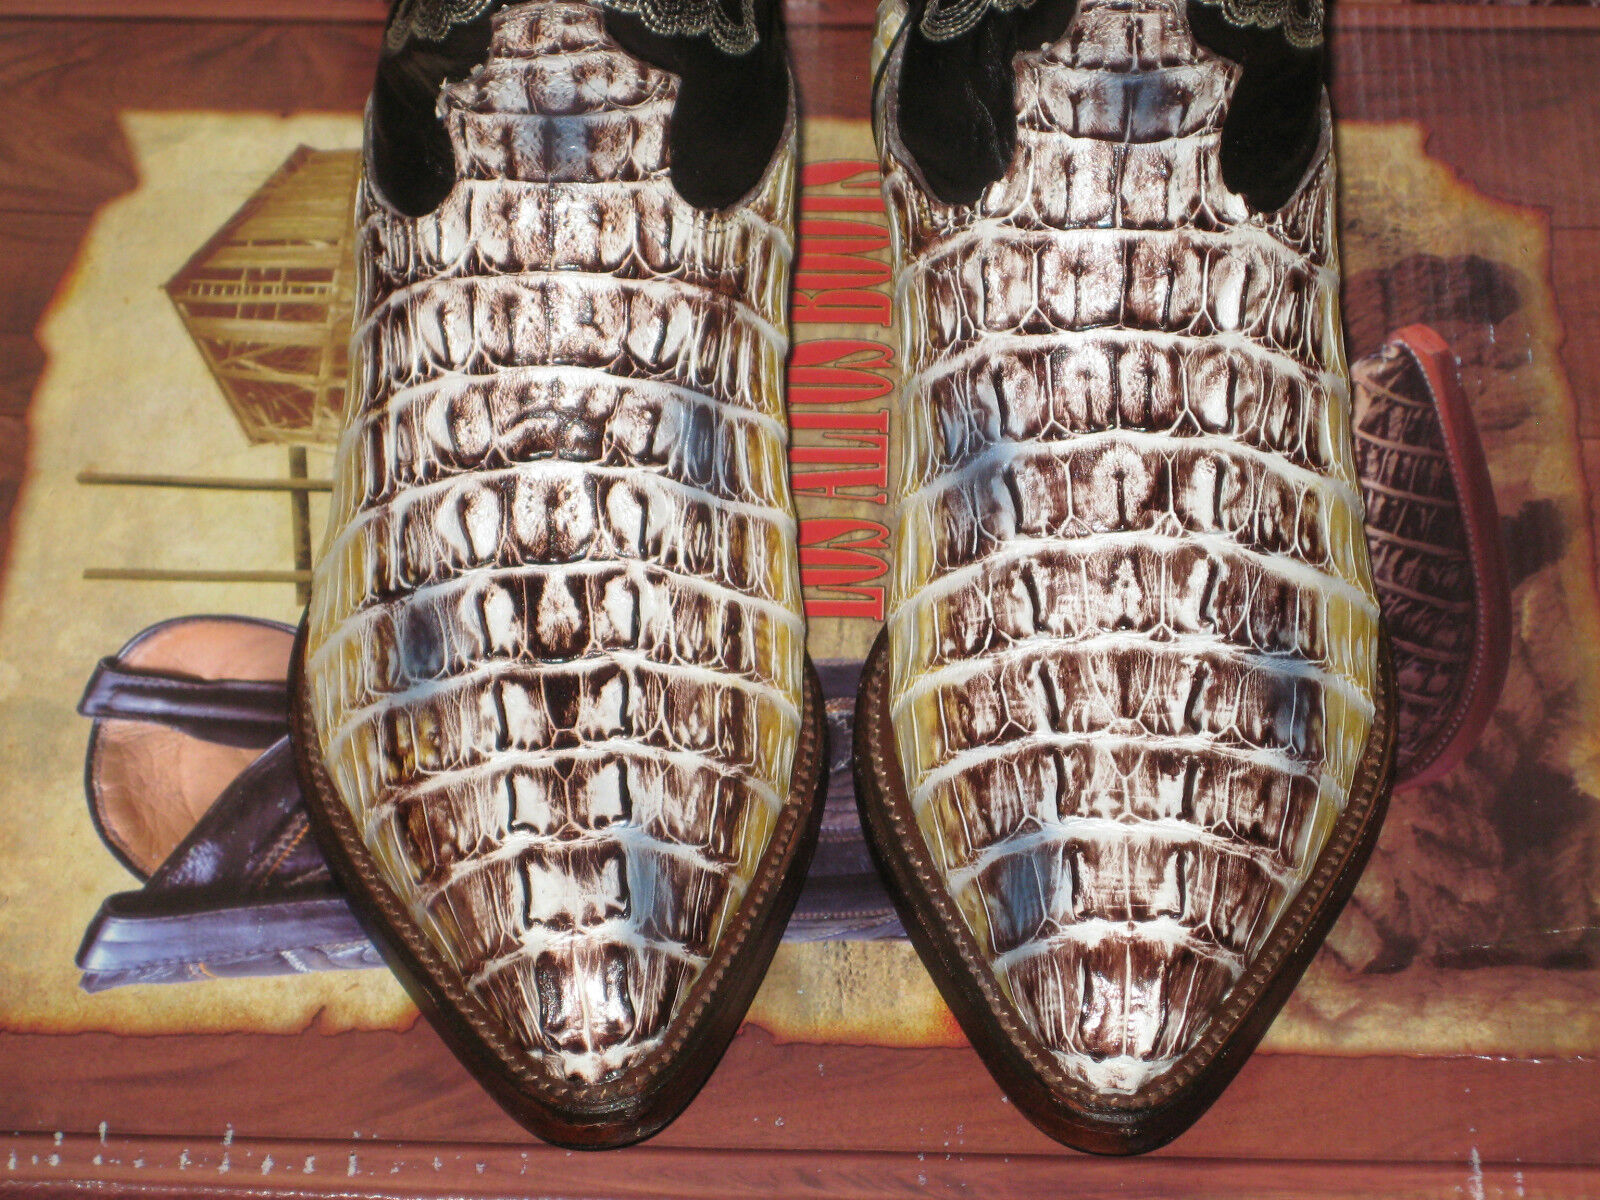 Los altos Mujeres Natural Original Bota de vaquero de occidental de cola de vaquero cocodrilo (M) L091491 535e97